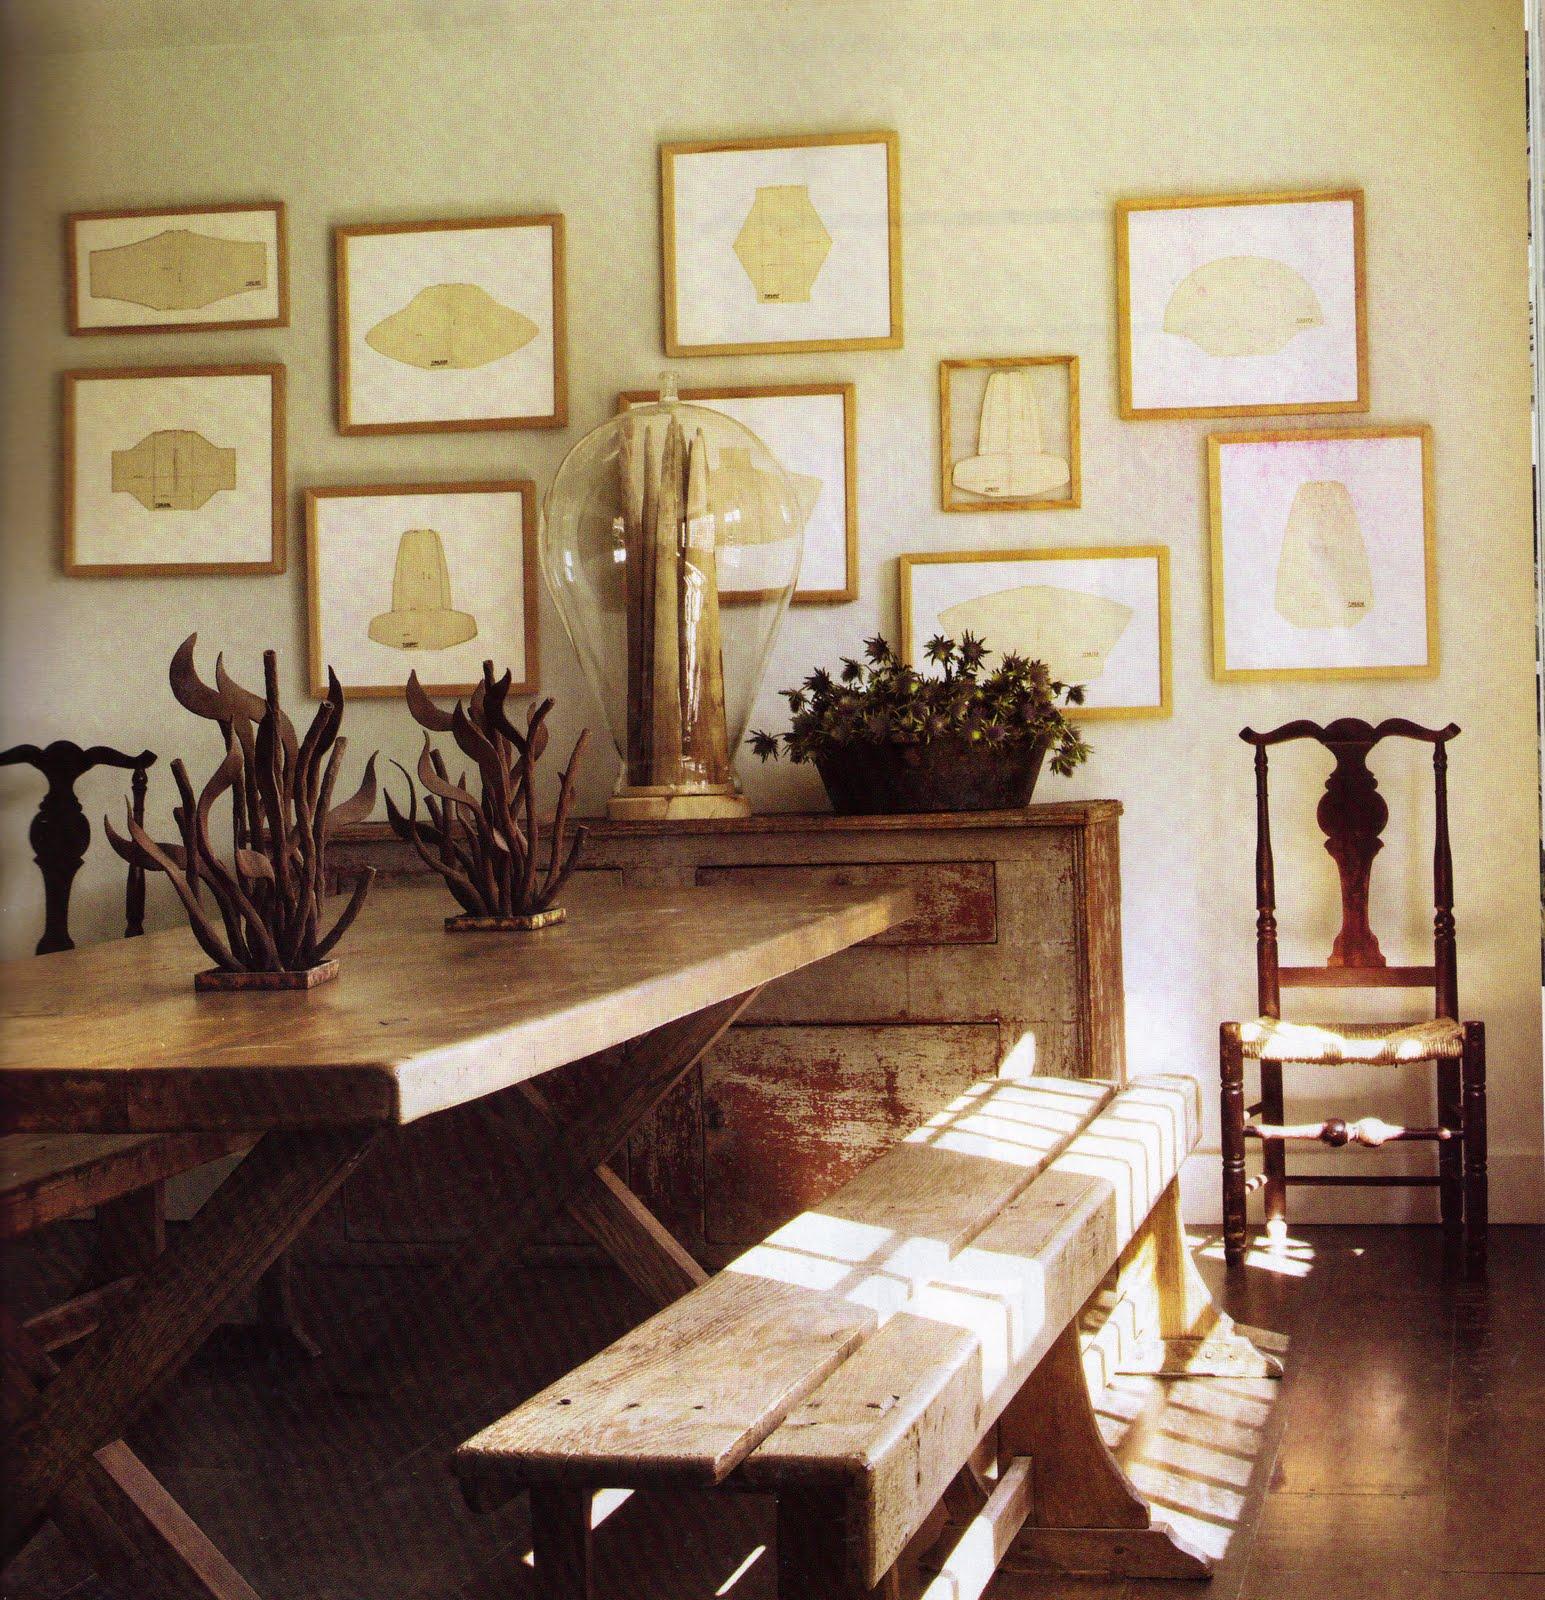 Homeworks Interior Design: Interior Design In Long Island